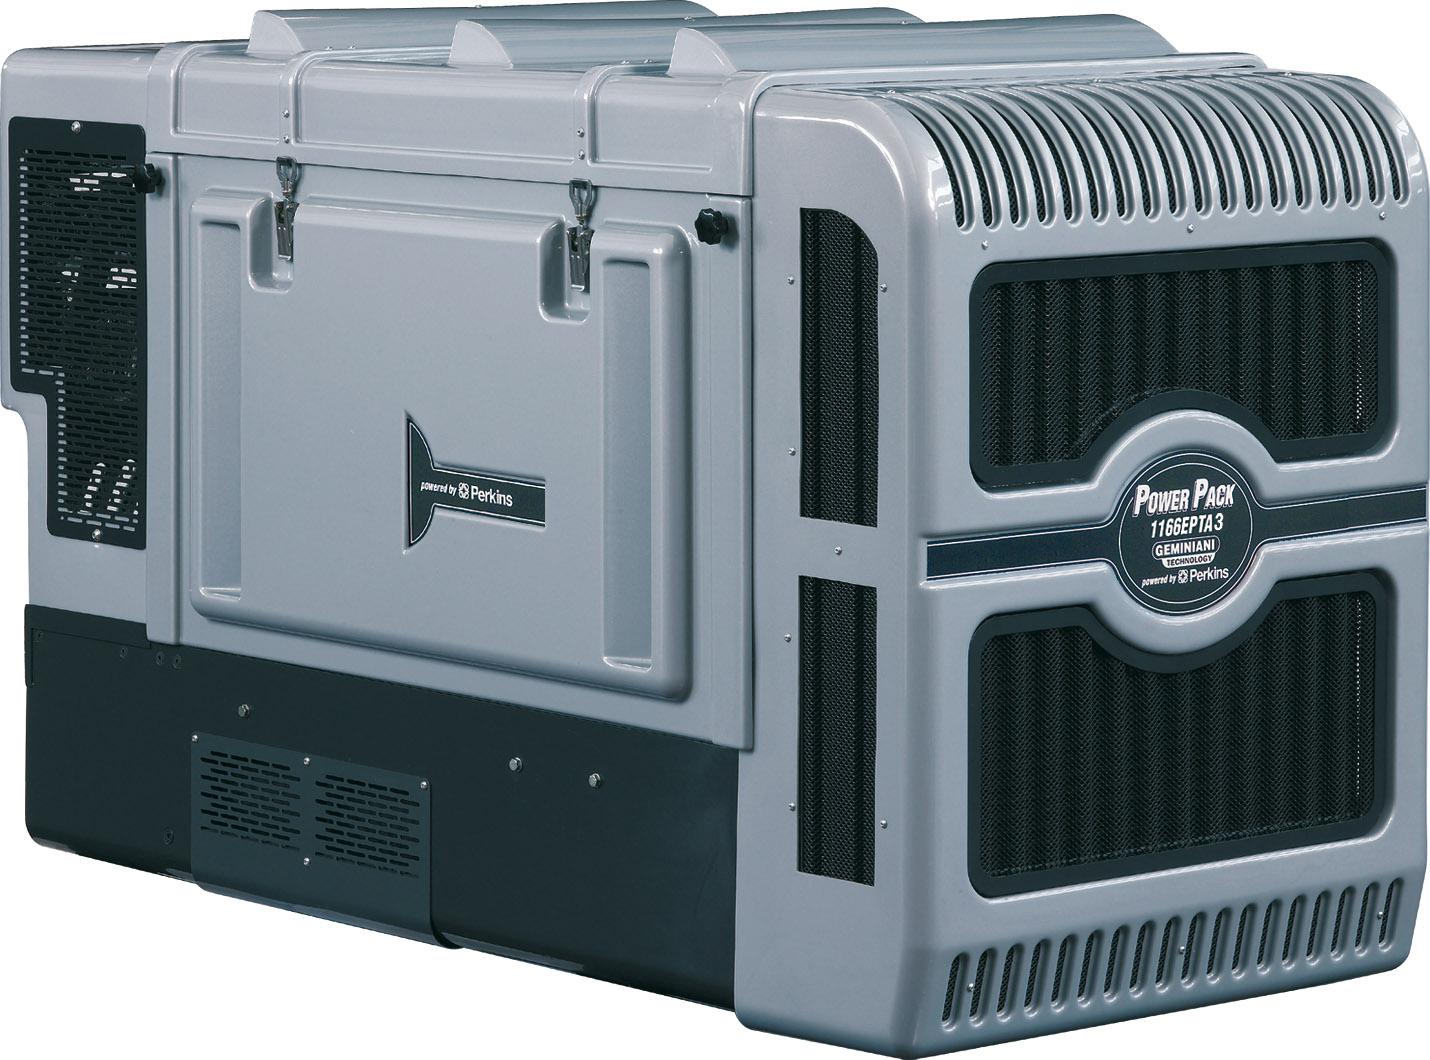 Power Pack 1166EPTA3